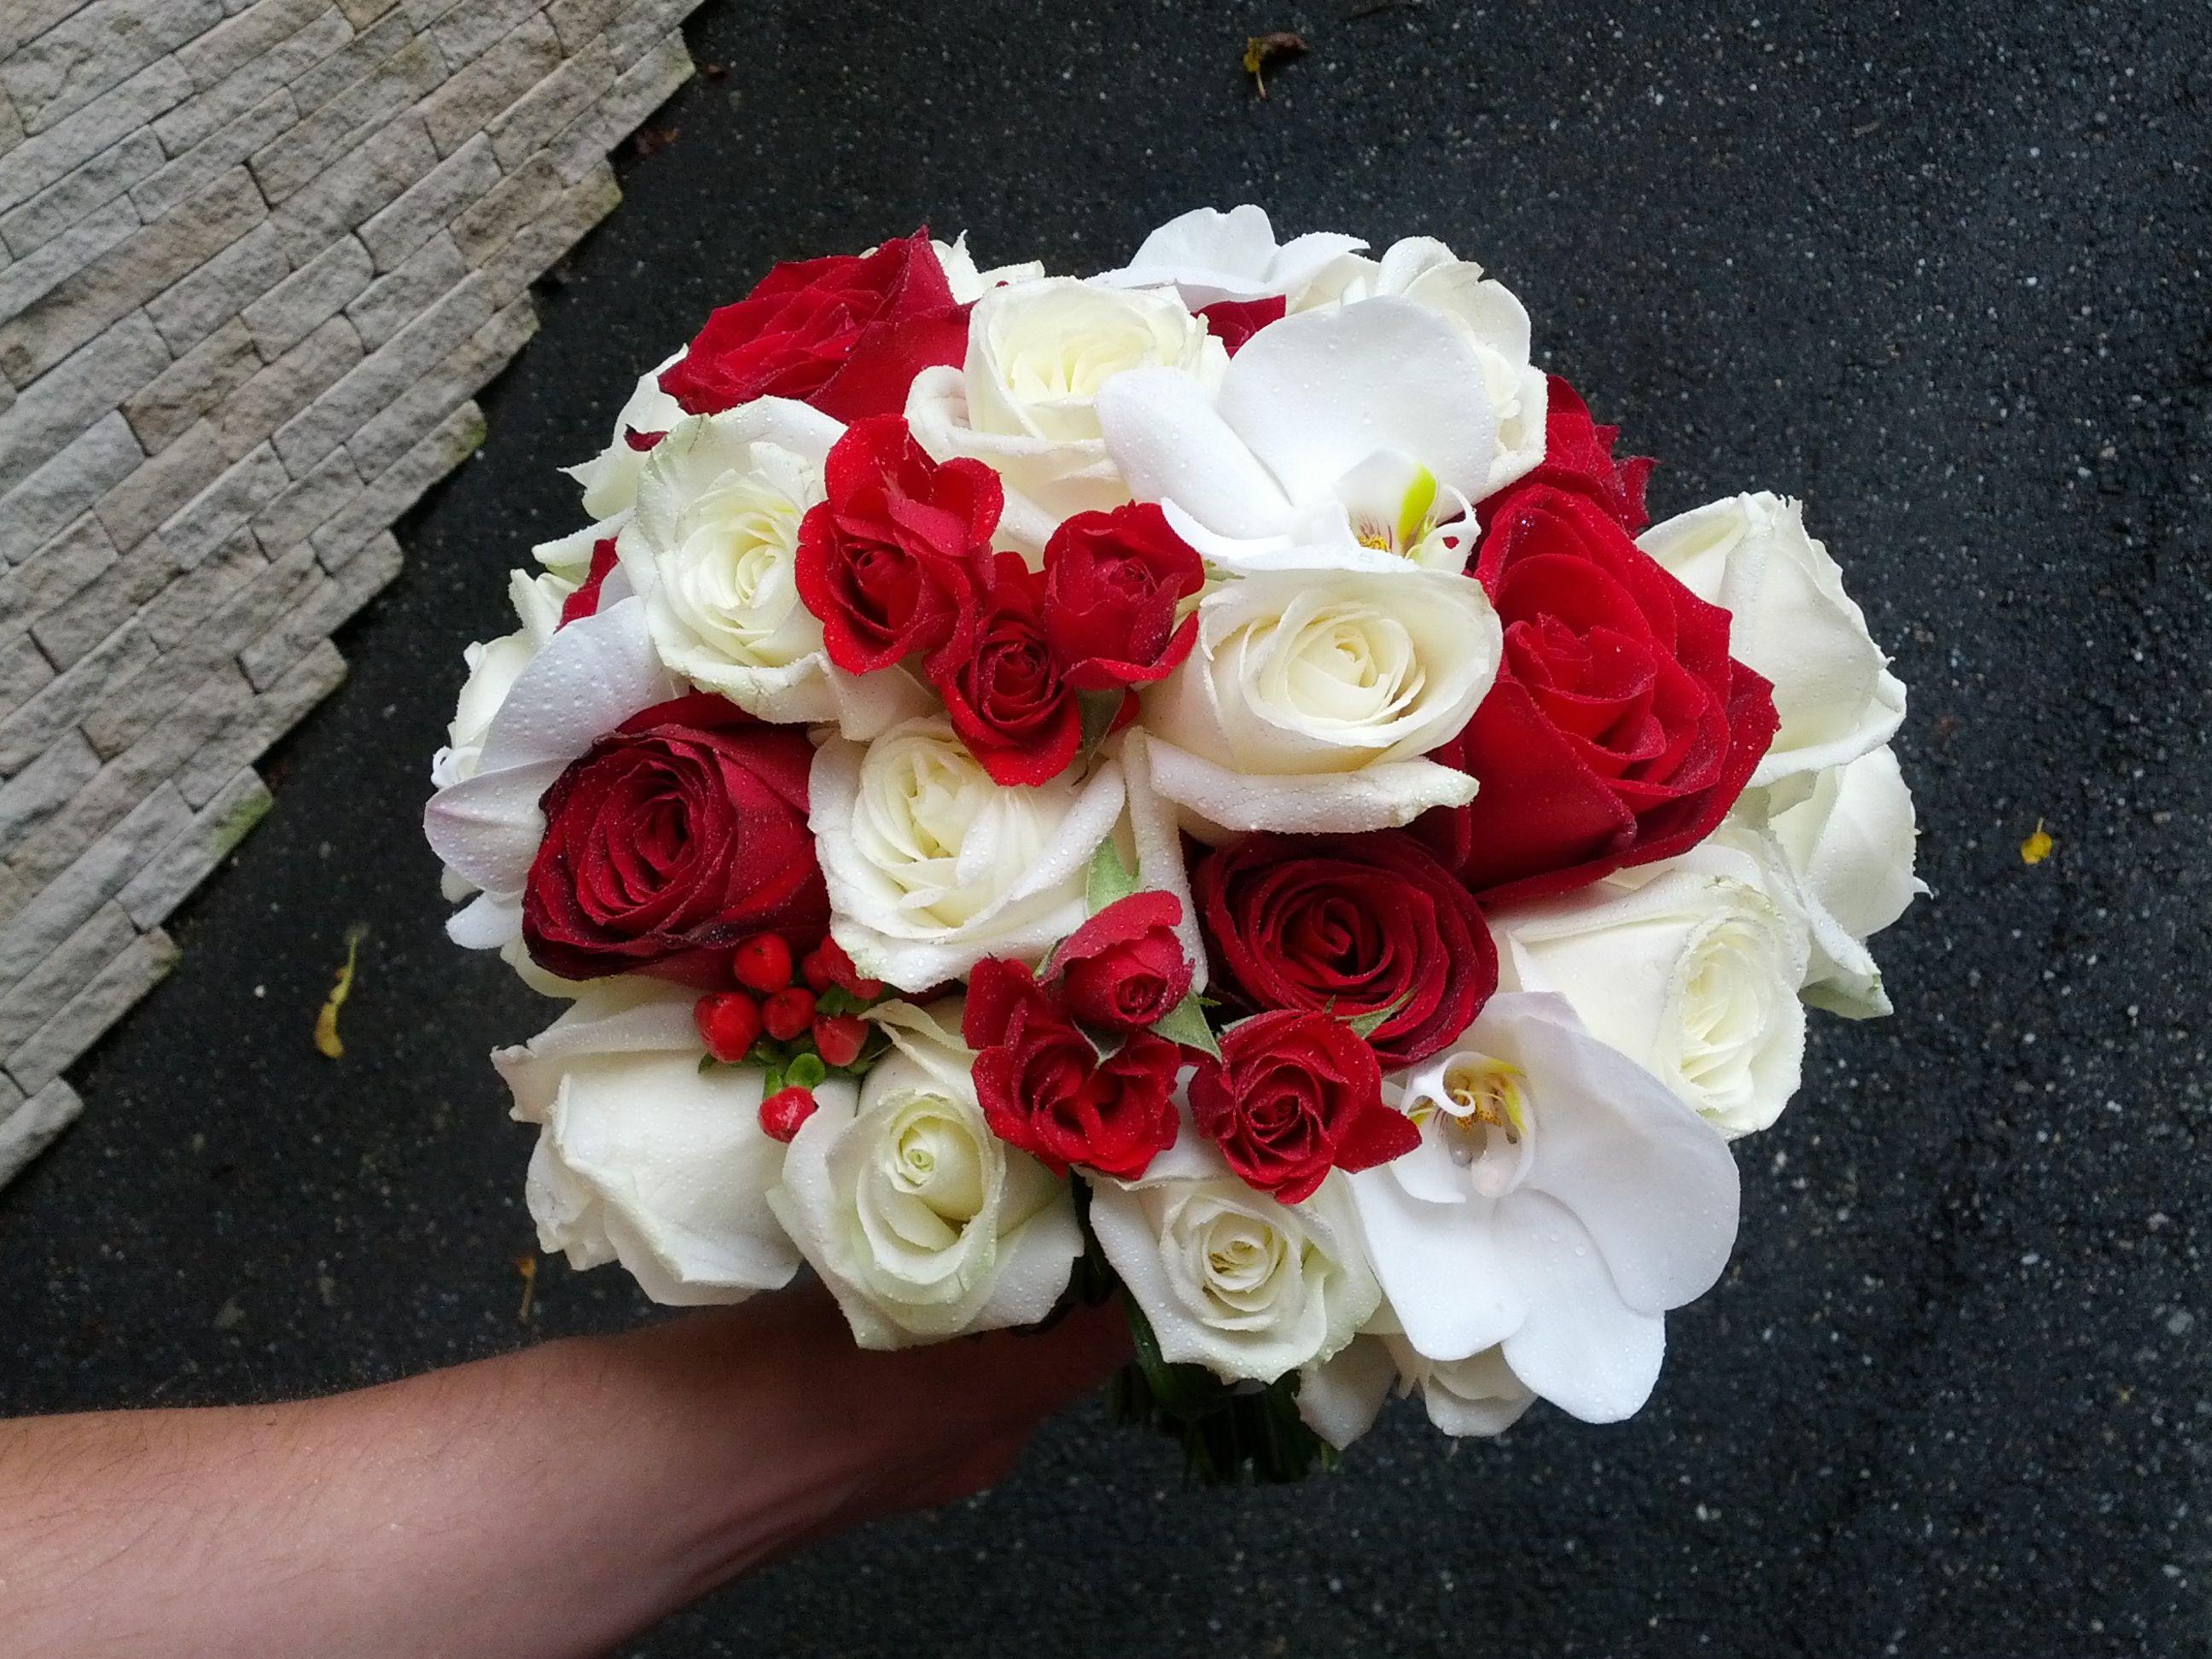 Buchet De Mireasa Cu Trandafiri Albi Rosii Si Orhidee Phalenopsis